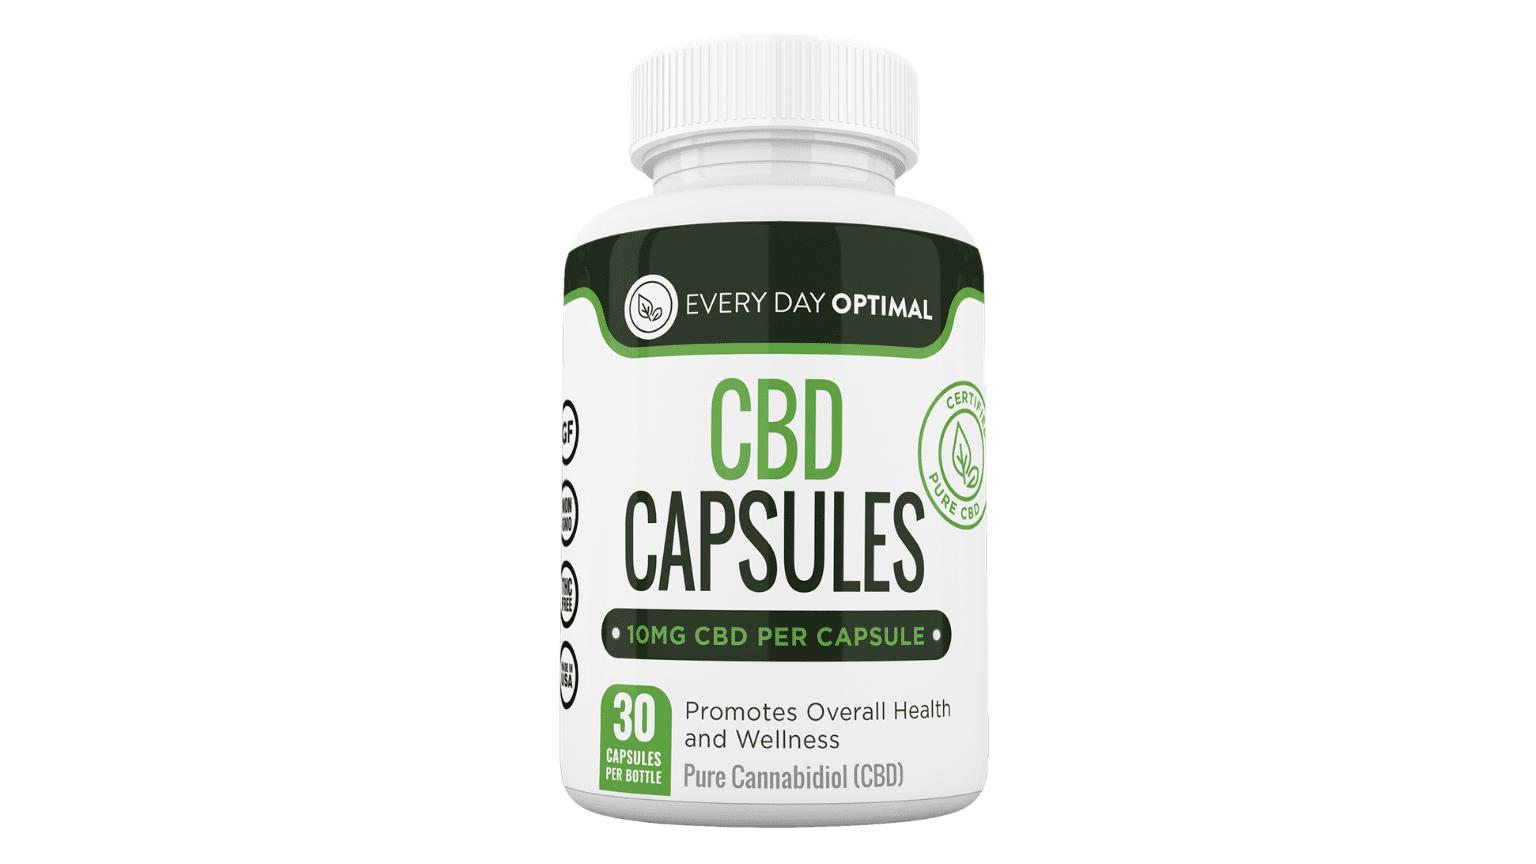 every-day-optimal-cbd-capsules